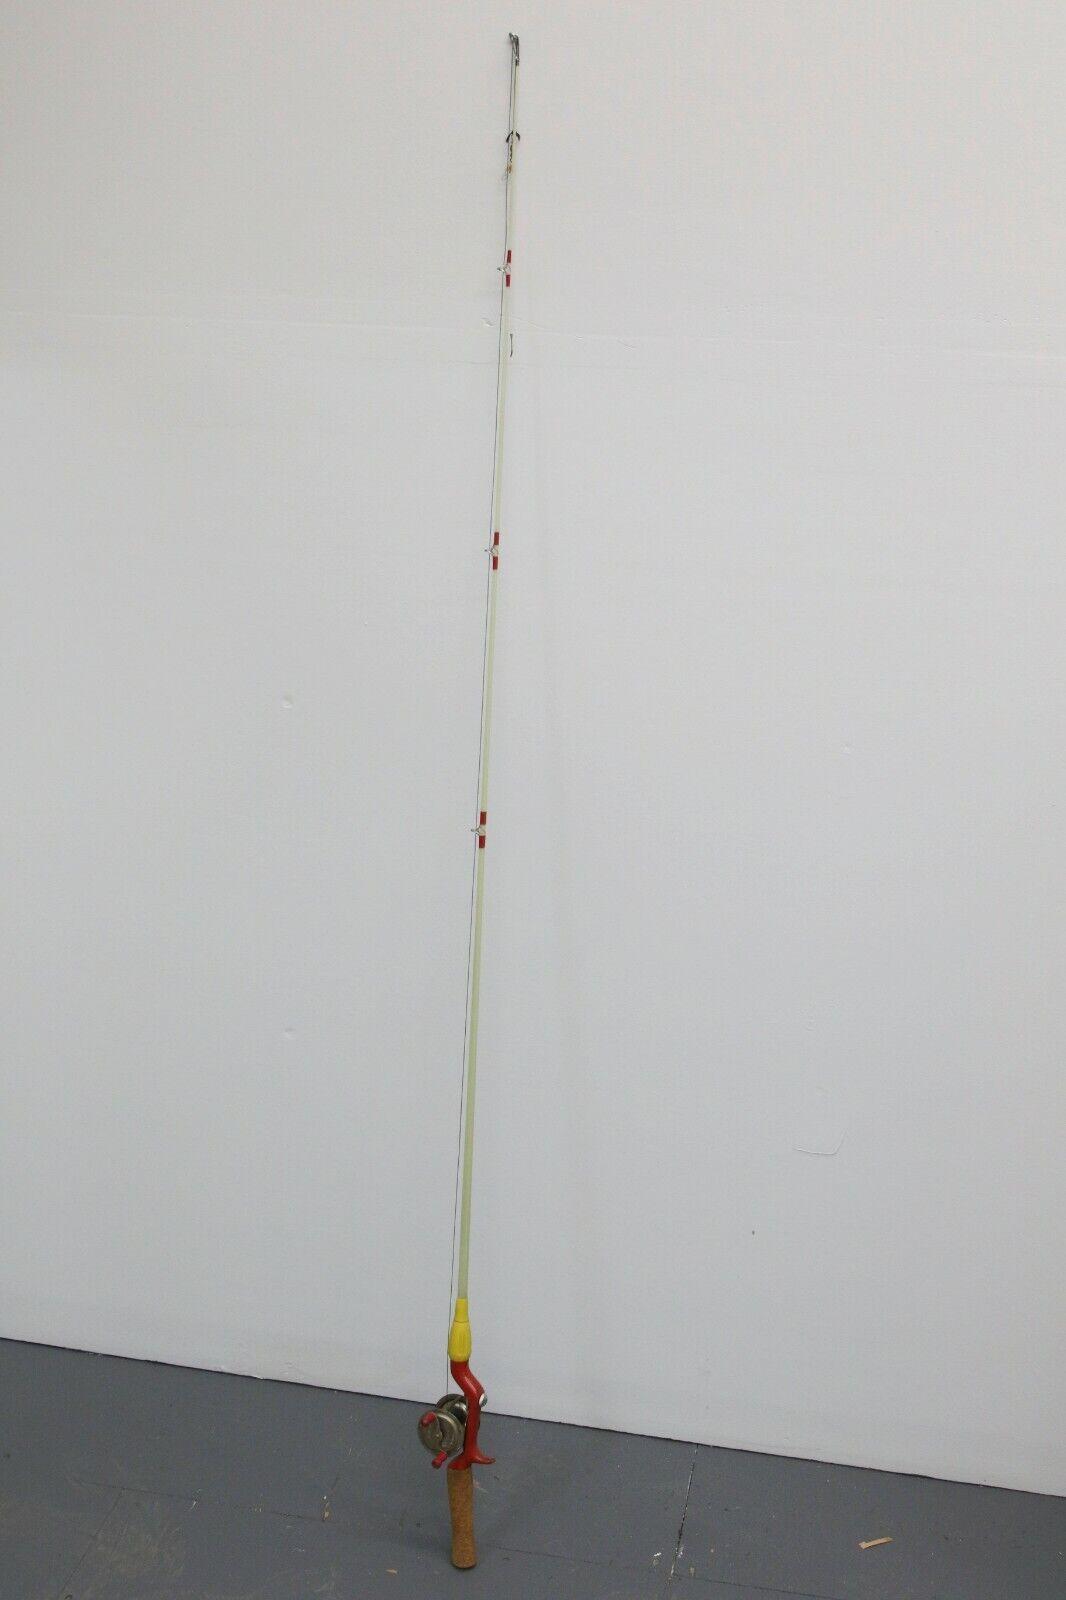 Vintage Hot Rod HRS Corcho manejado de fibra de vidrio caña de pesCoche con Lawrence  3